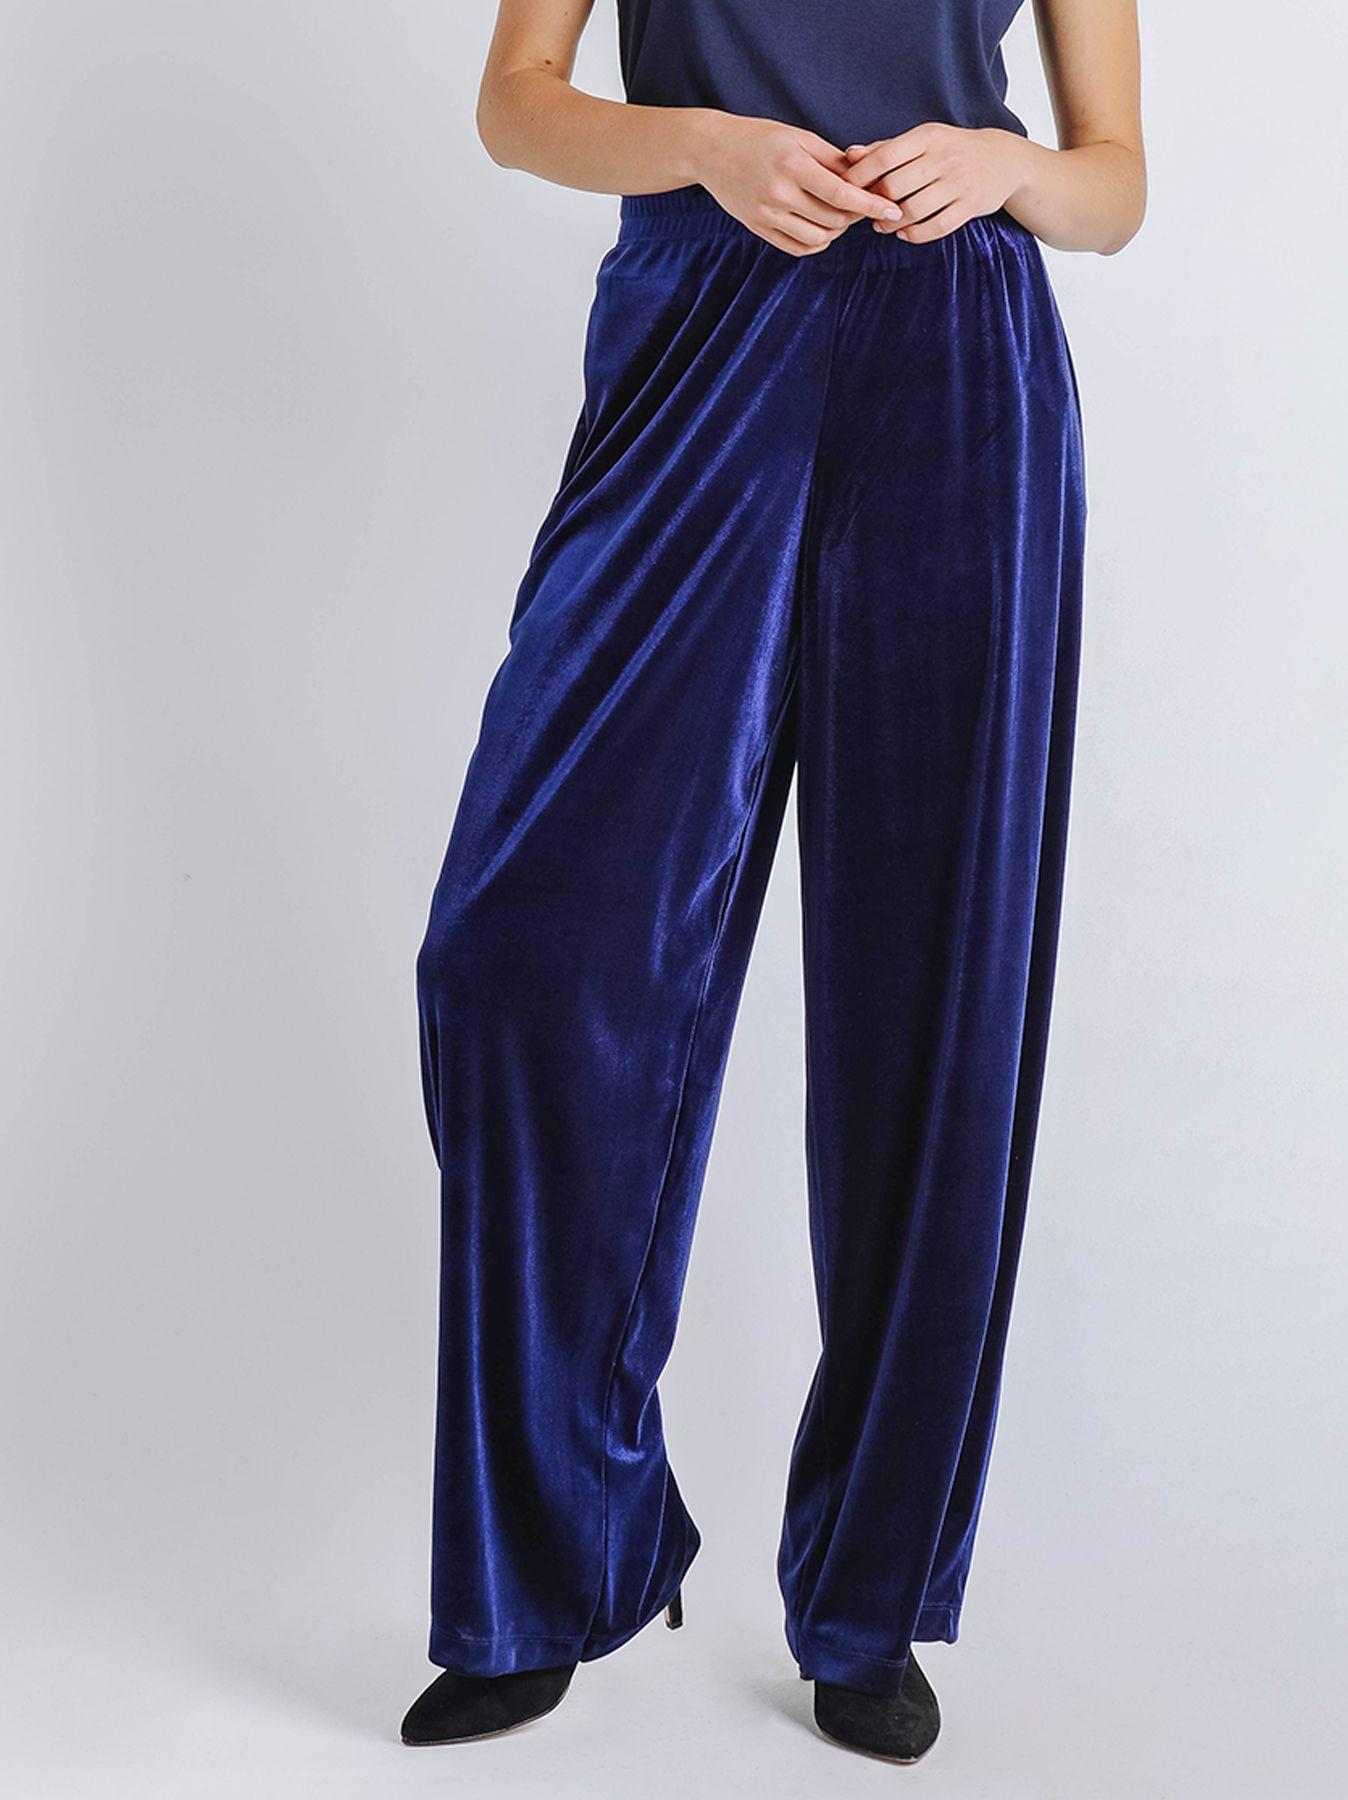 Pantalone palazzo in velluto